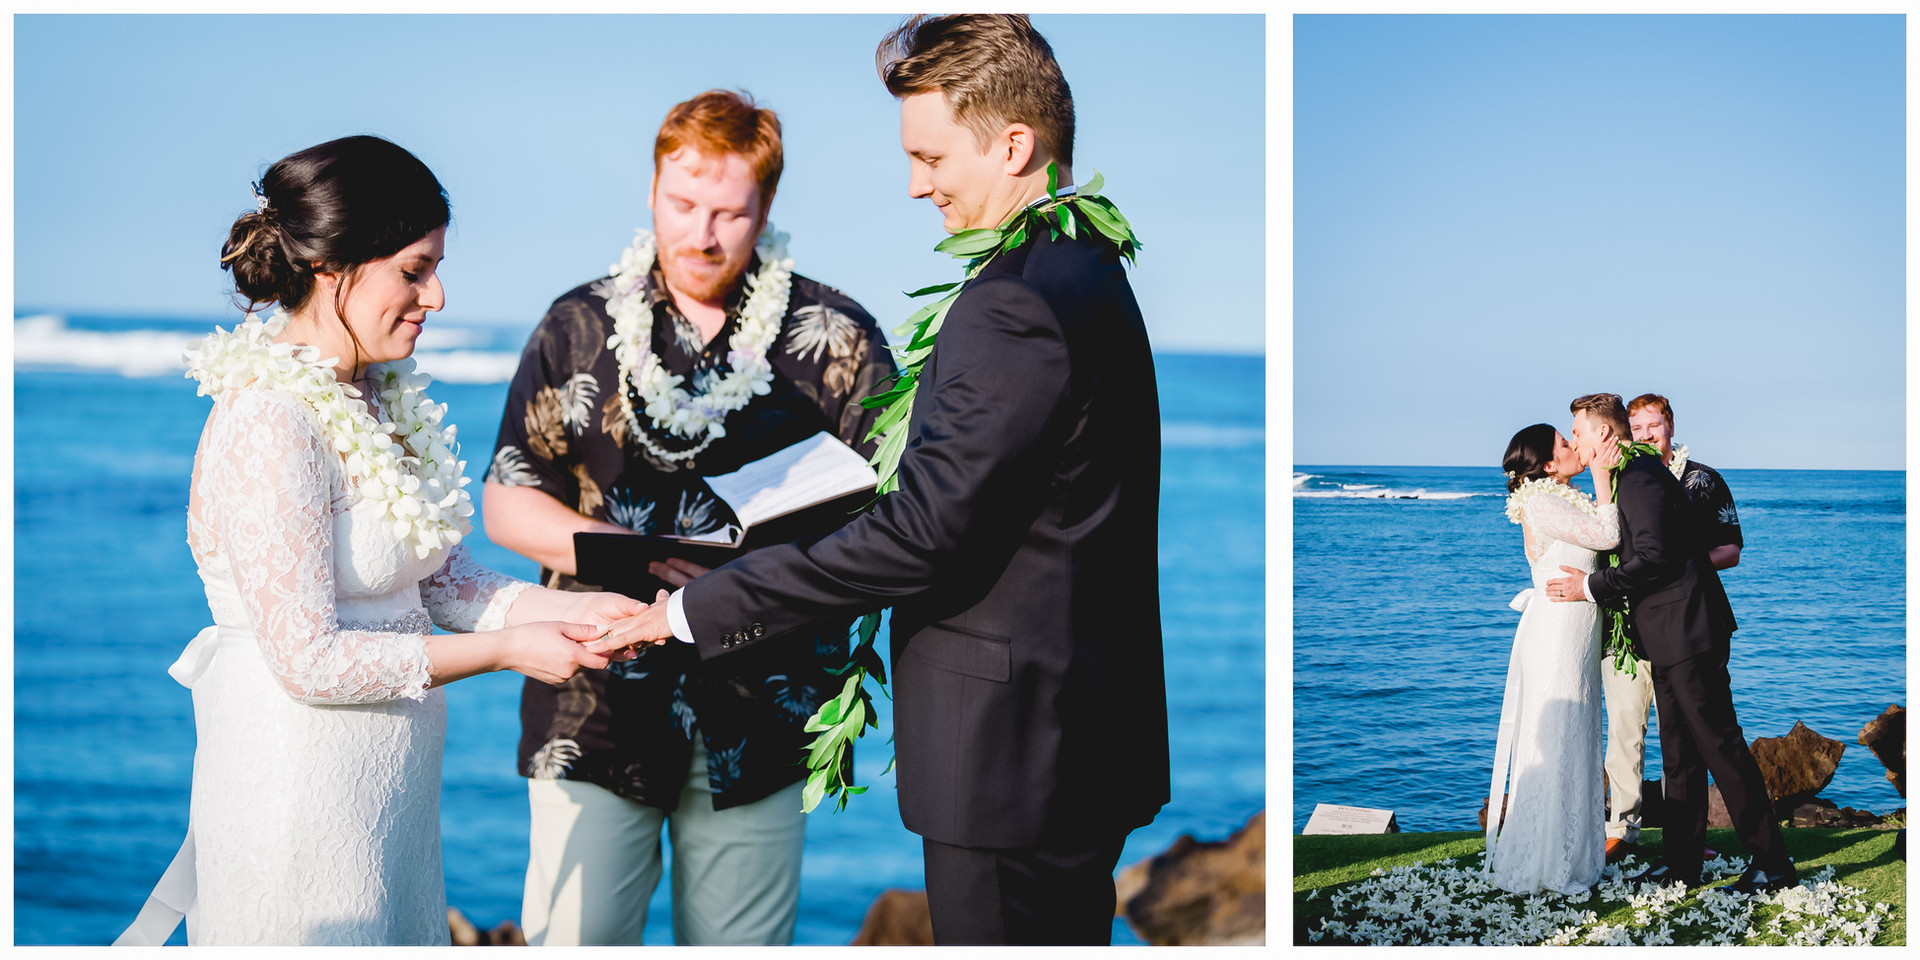 Hilton Weddings-1-2.jpg